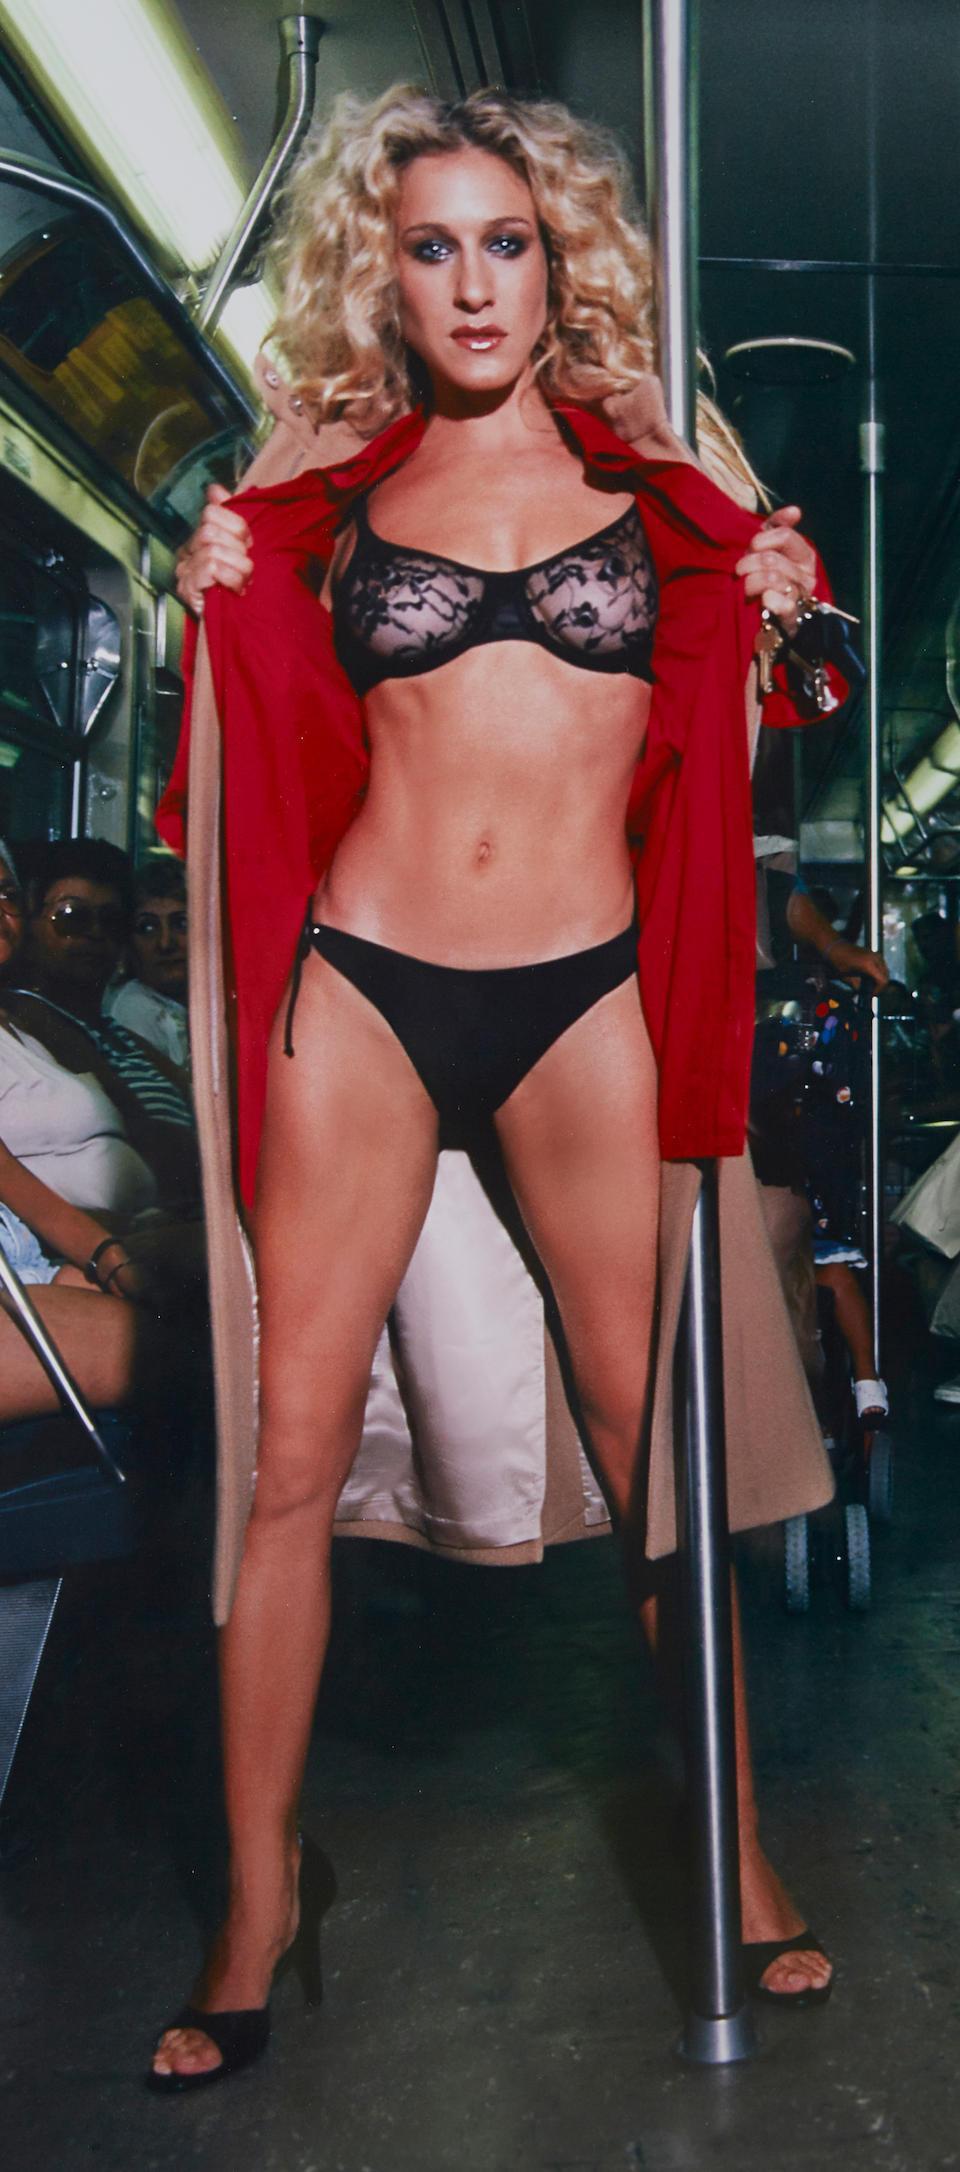 Sarah Jessica Parker hot pic